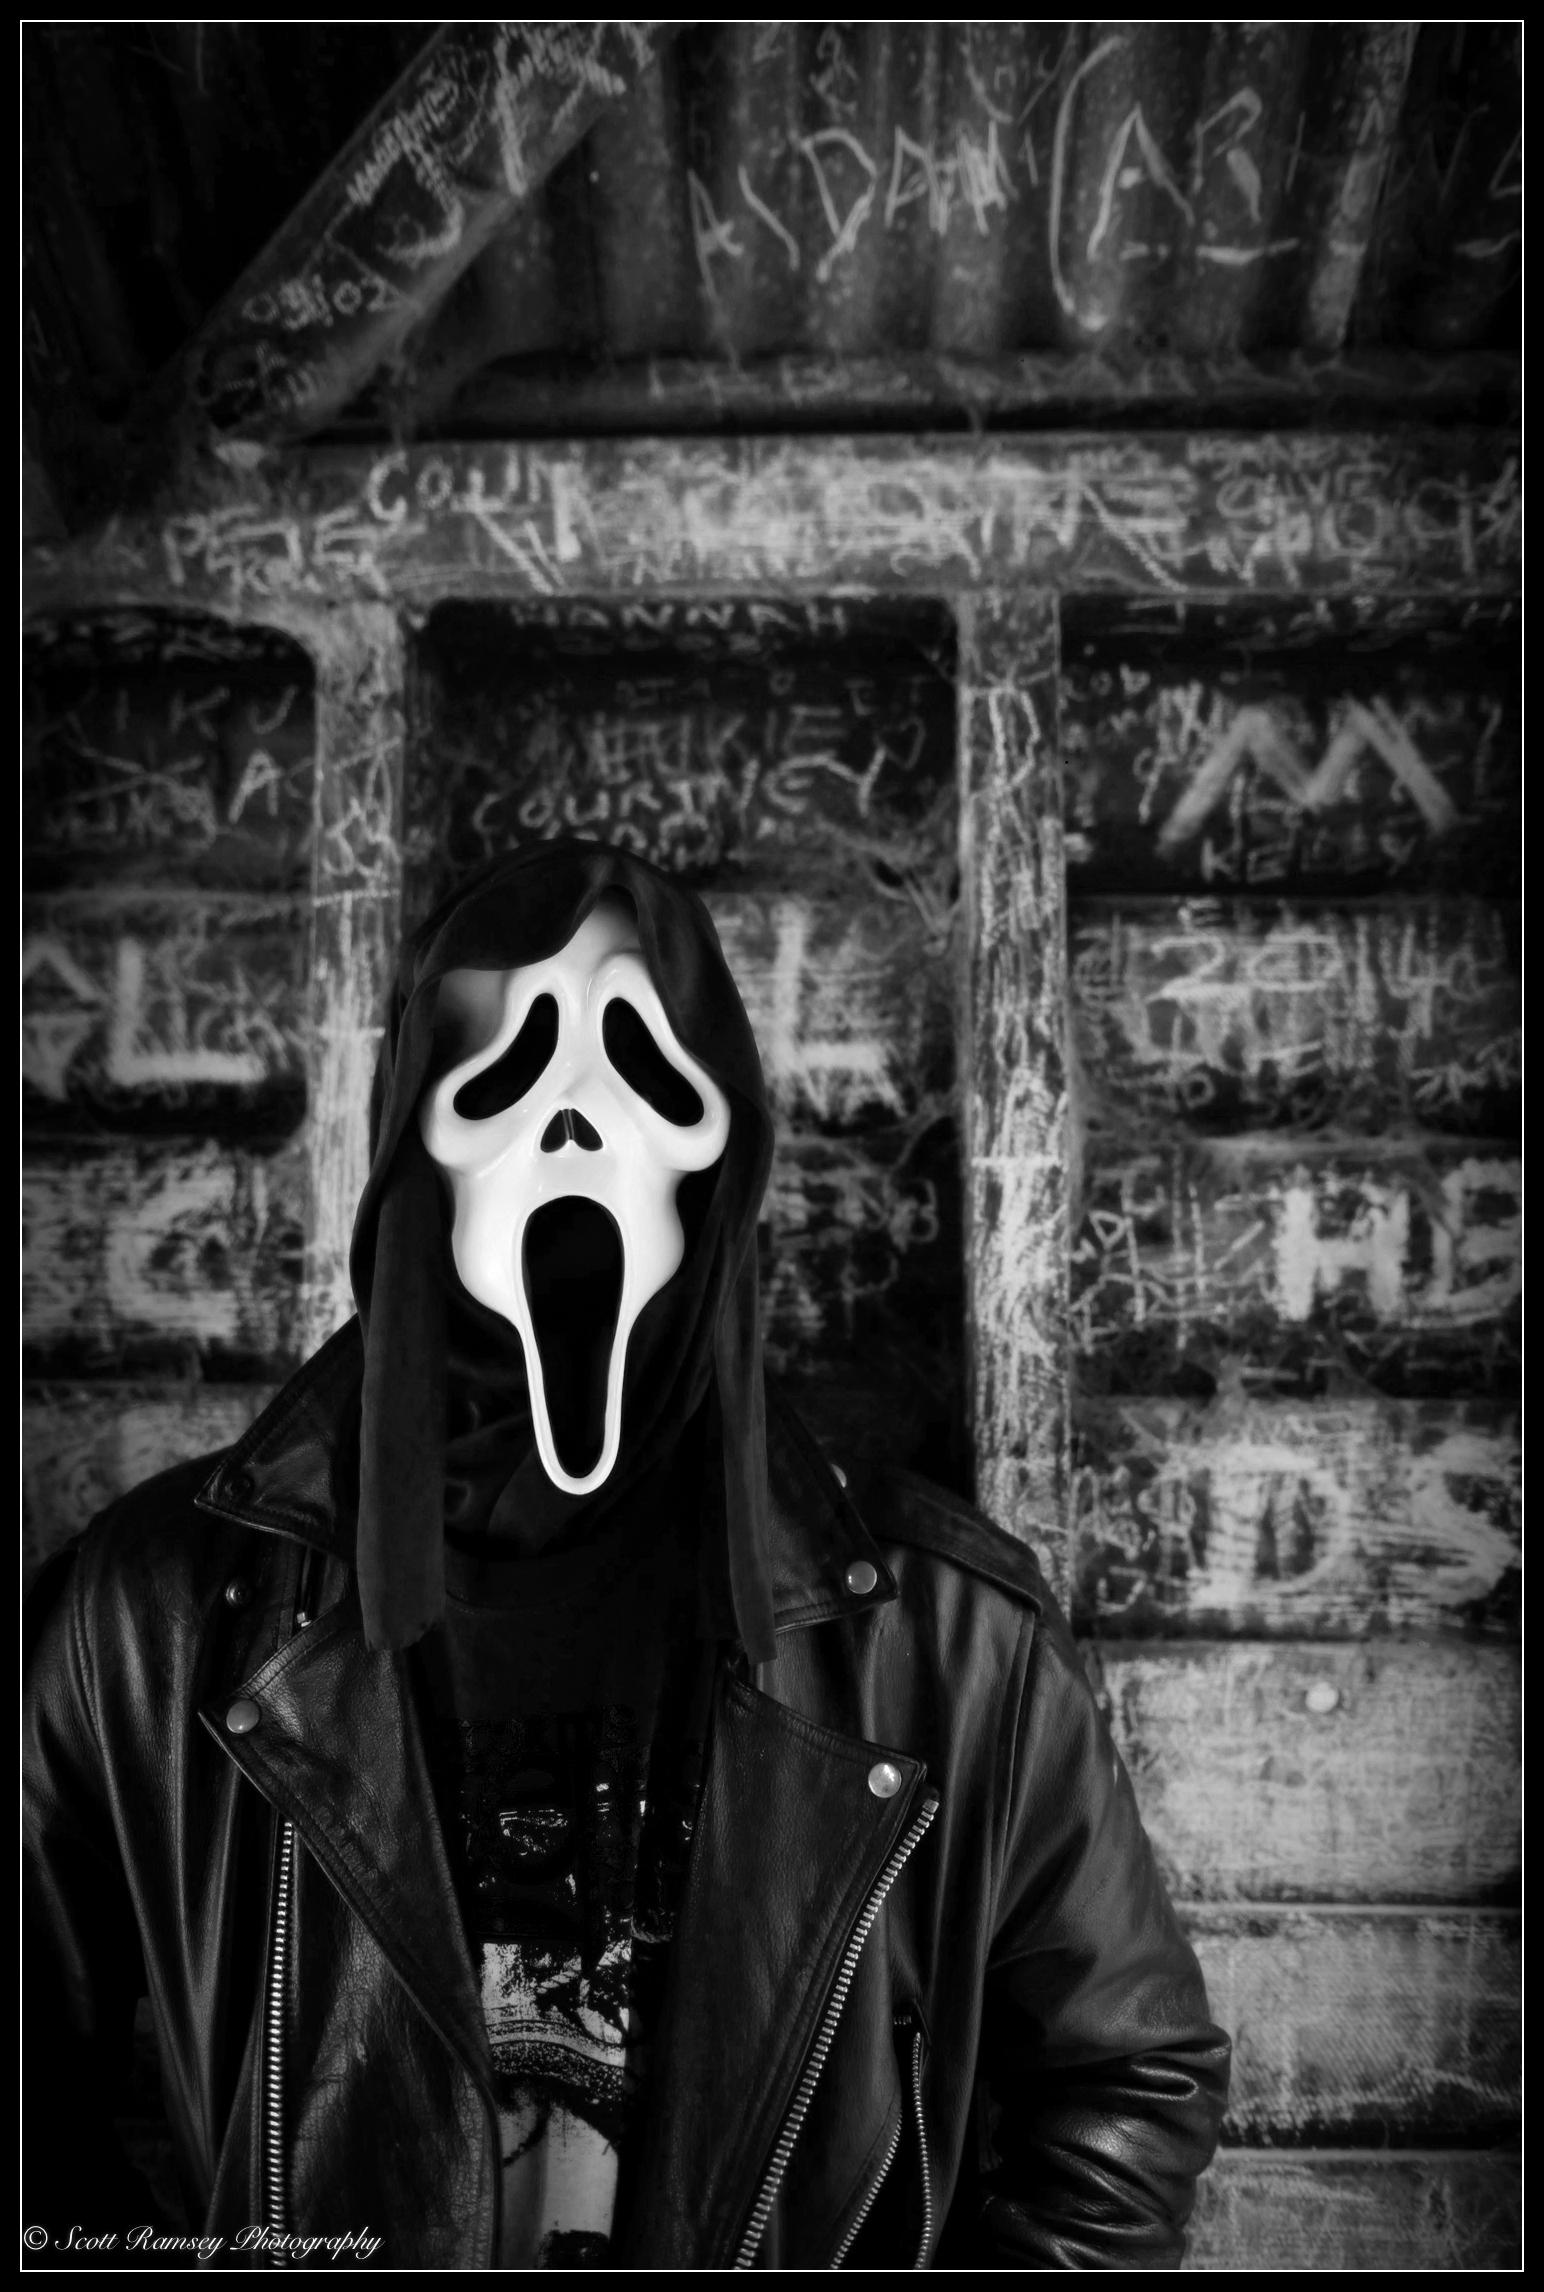 Halloween 2014. A masked man stands next to a graffiti filled wall. © Scott Ramsey Photography